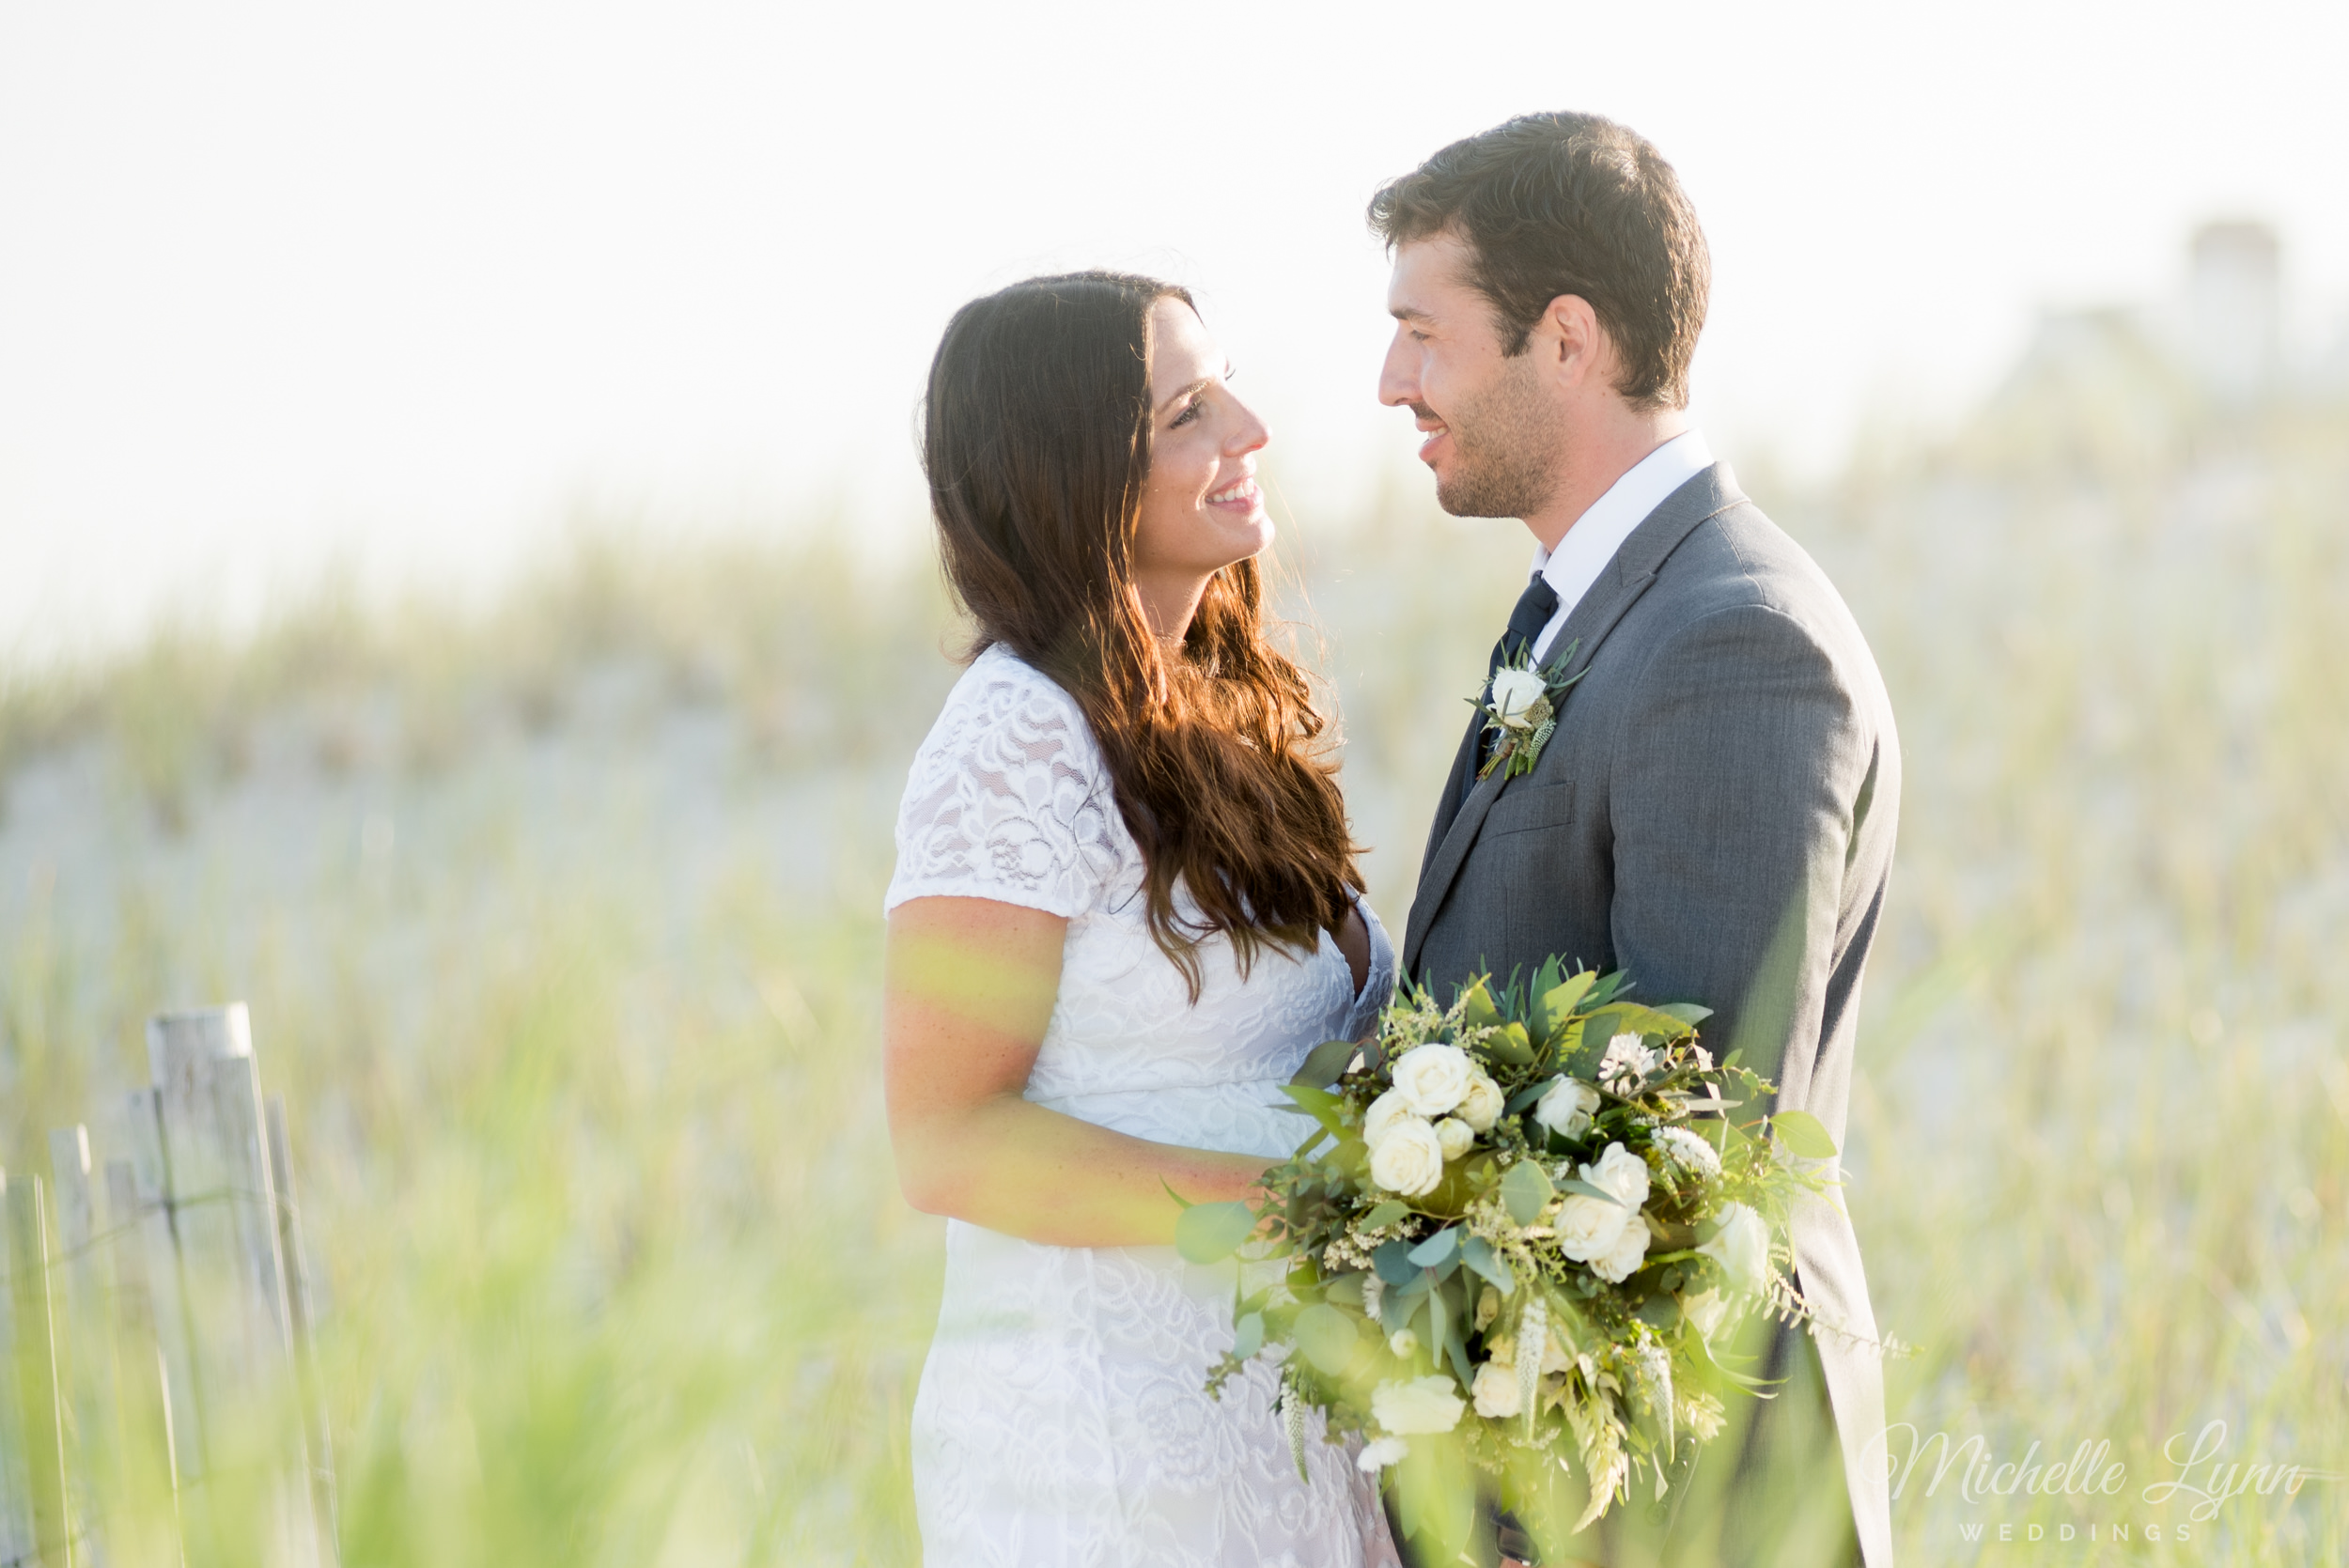 mlw-long-beach-island-new-jersey-wedding-photography-26.jpg